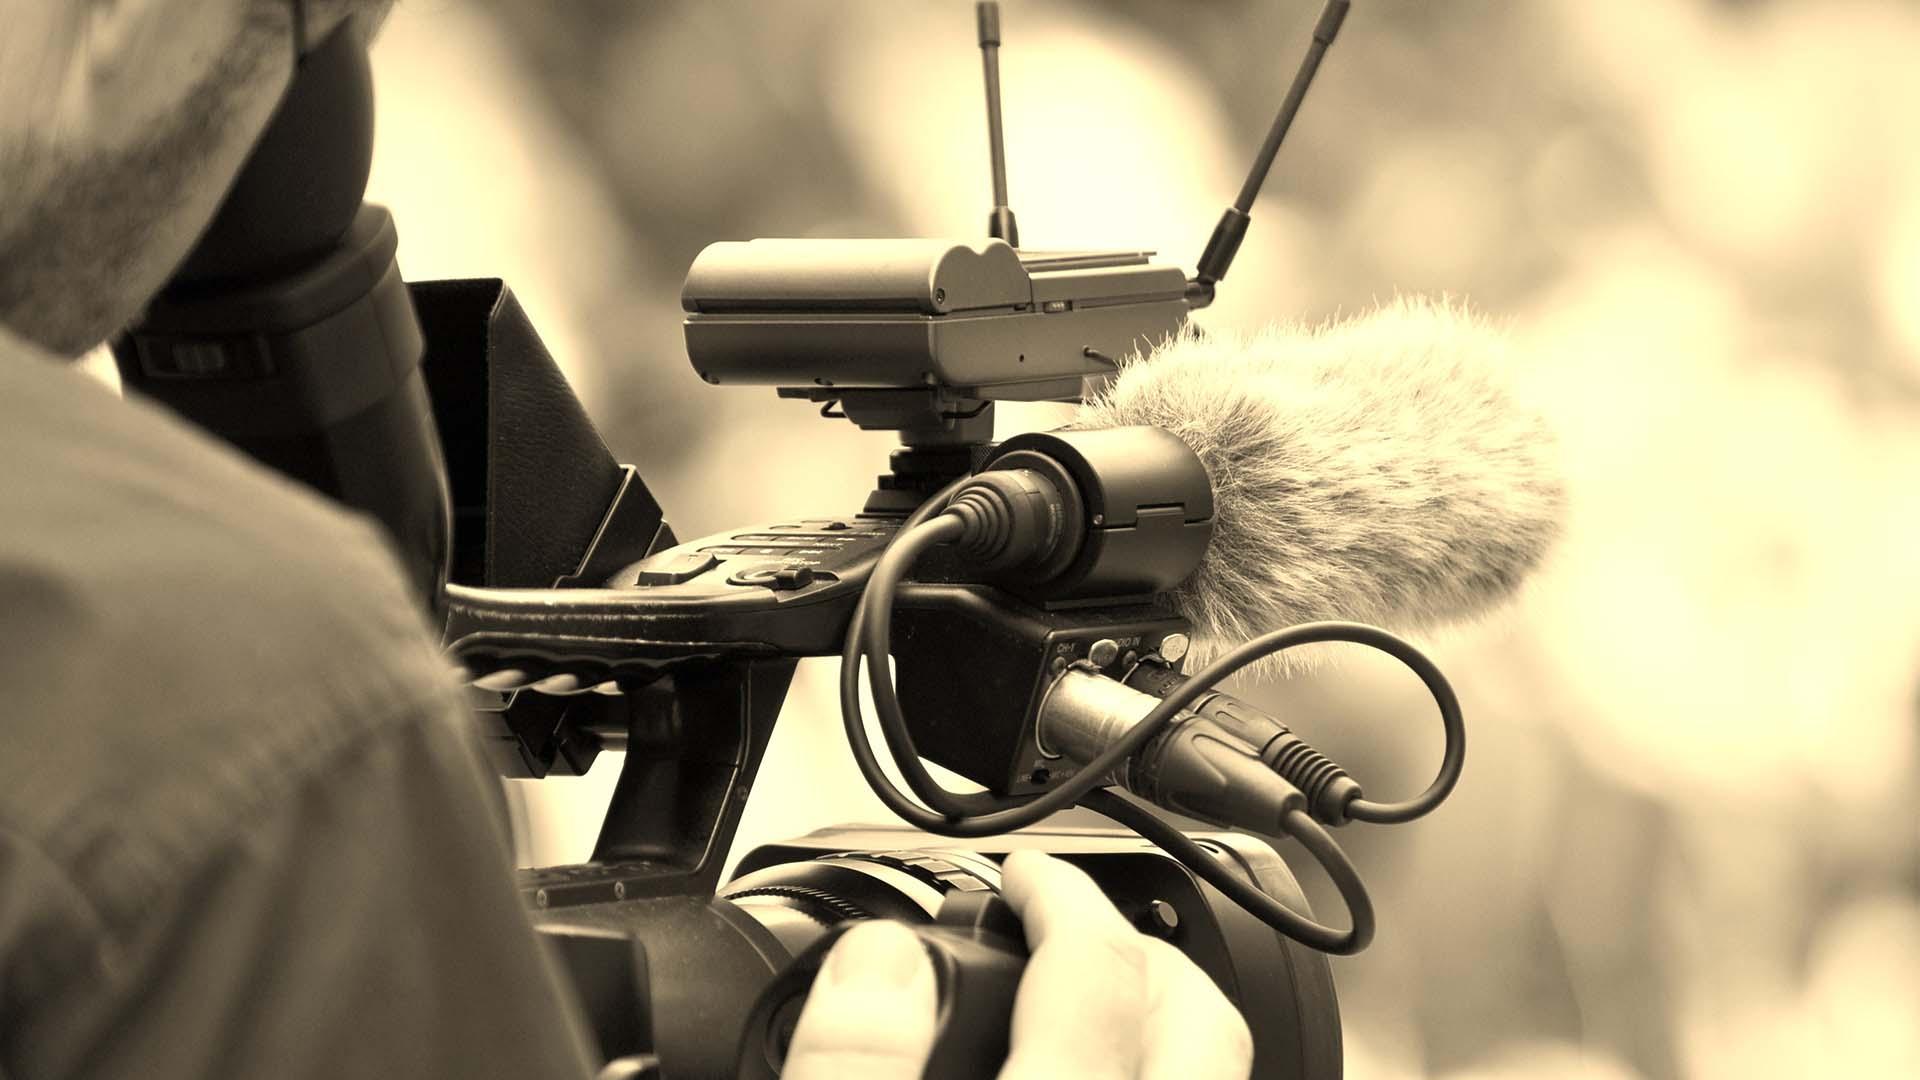 Film Maker and Corporate Video Errors